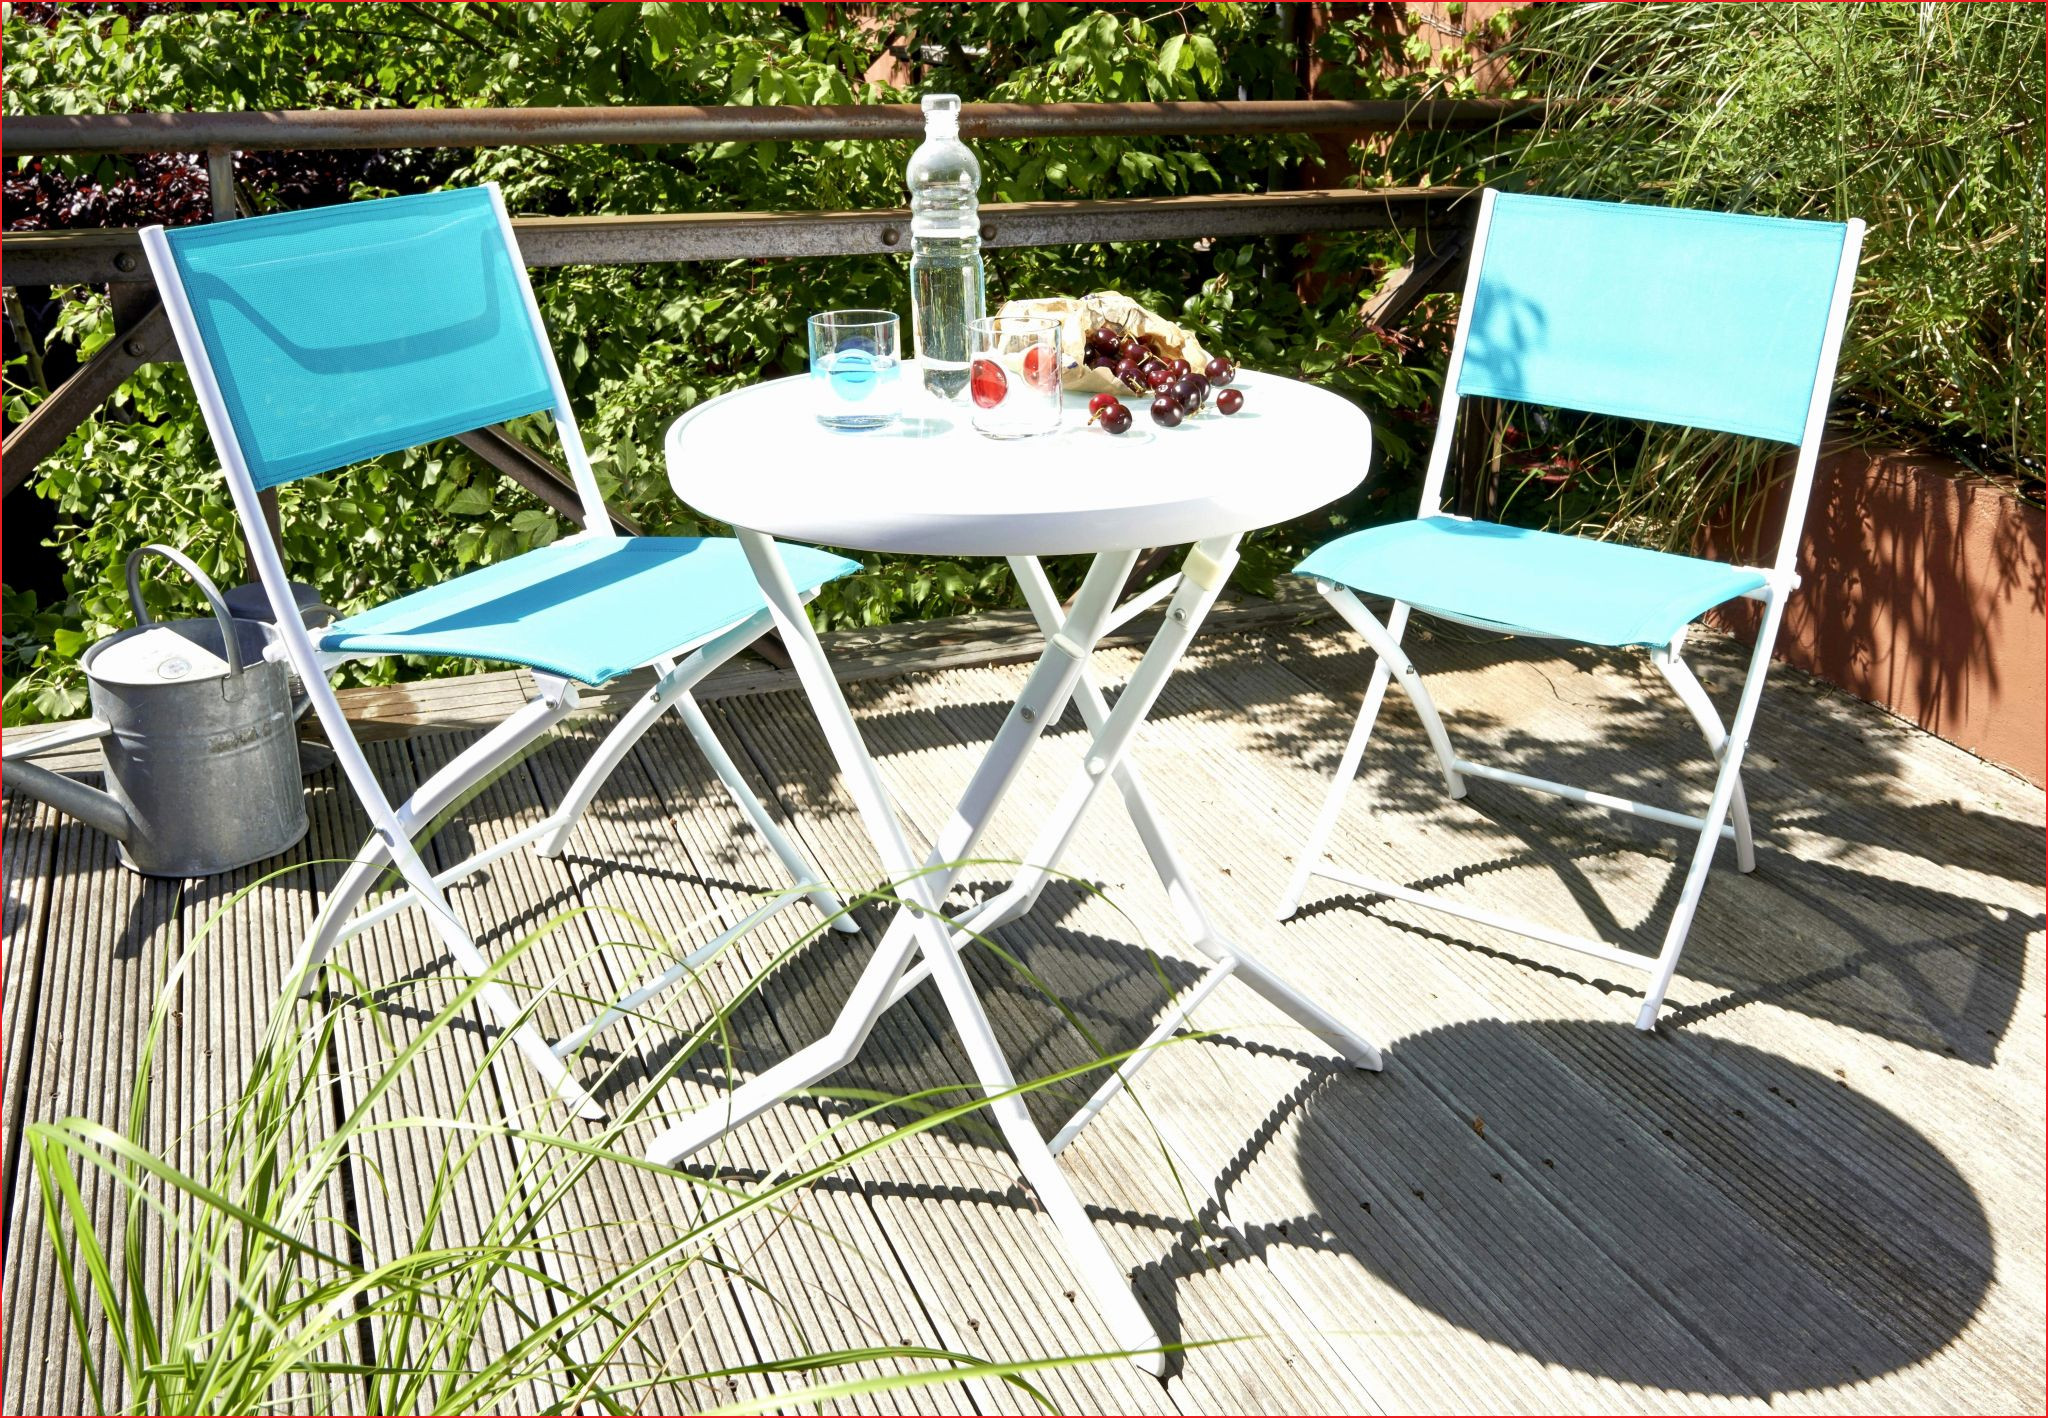 Salon De Jardin En Aluminium Pas Cher Nouveau Jardin Archives Francesginsberg Of 31 Inspirant Salon De Jardin En Aluminium Pas Cher